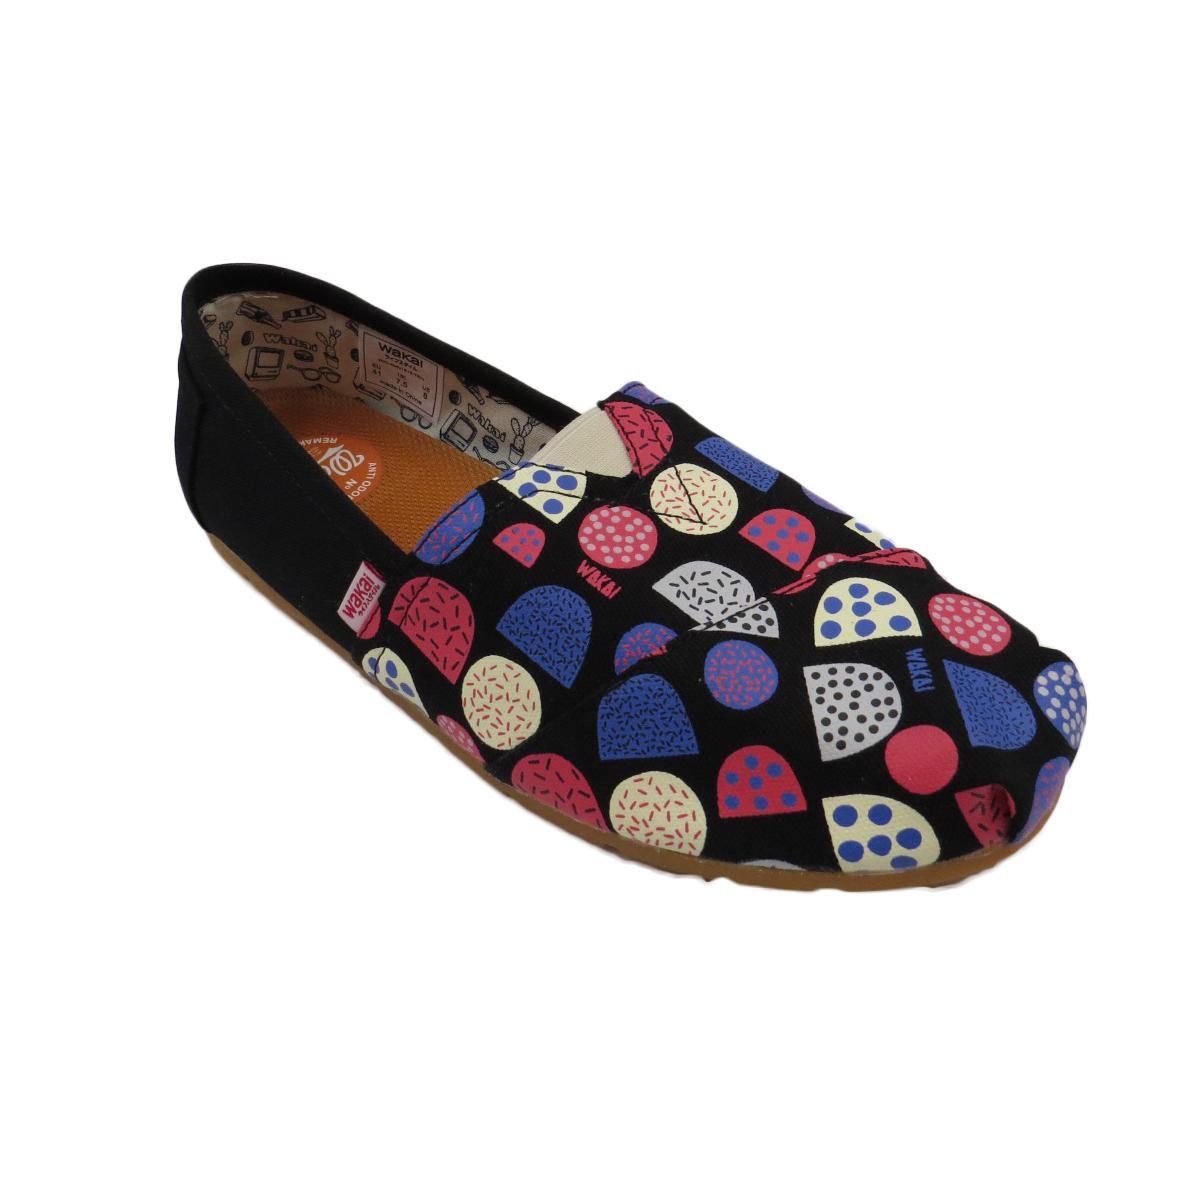 Wakai Ten Men S Slip On Shoes Black Promo Code